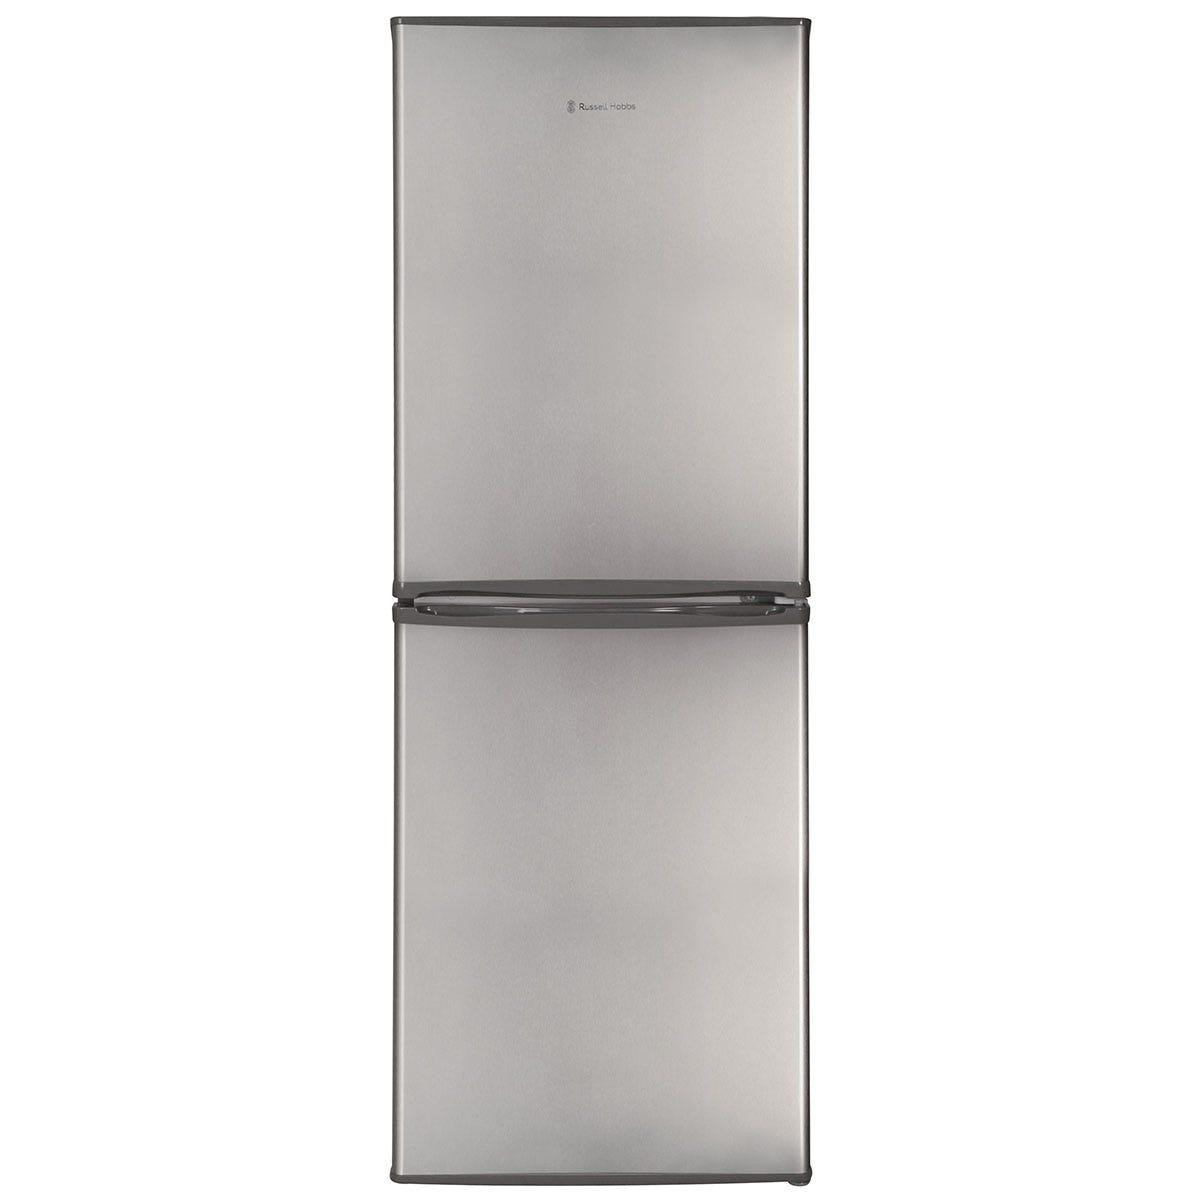 Russell Hobbs RH50FF144 167L Fridge Freezer - Stainless Steel